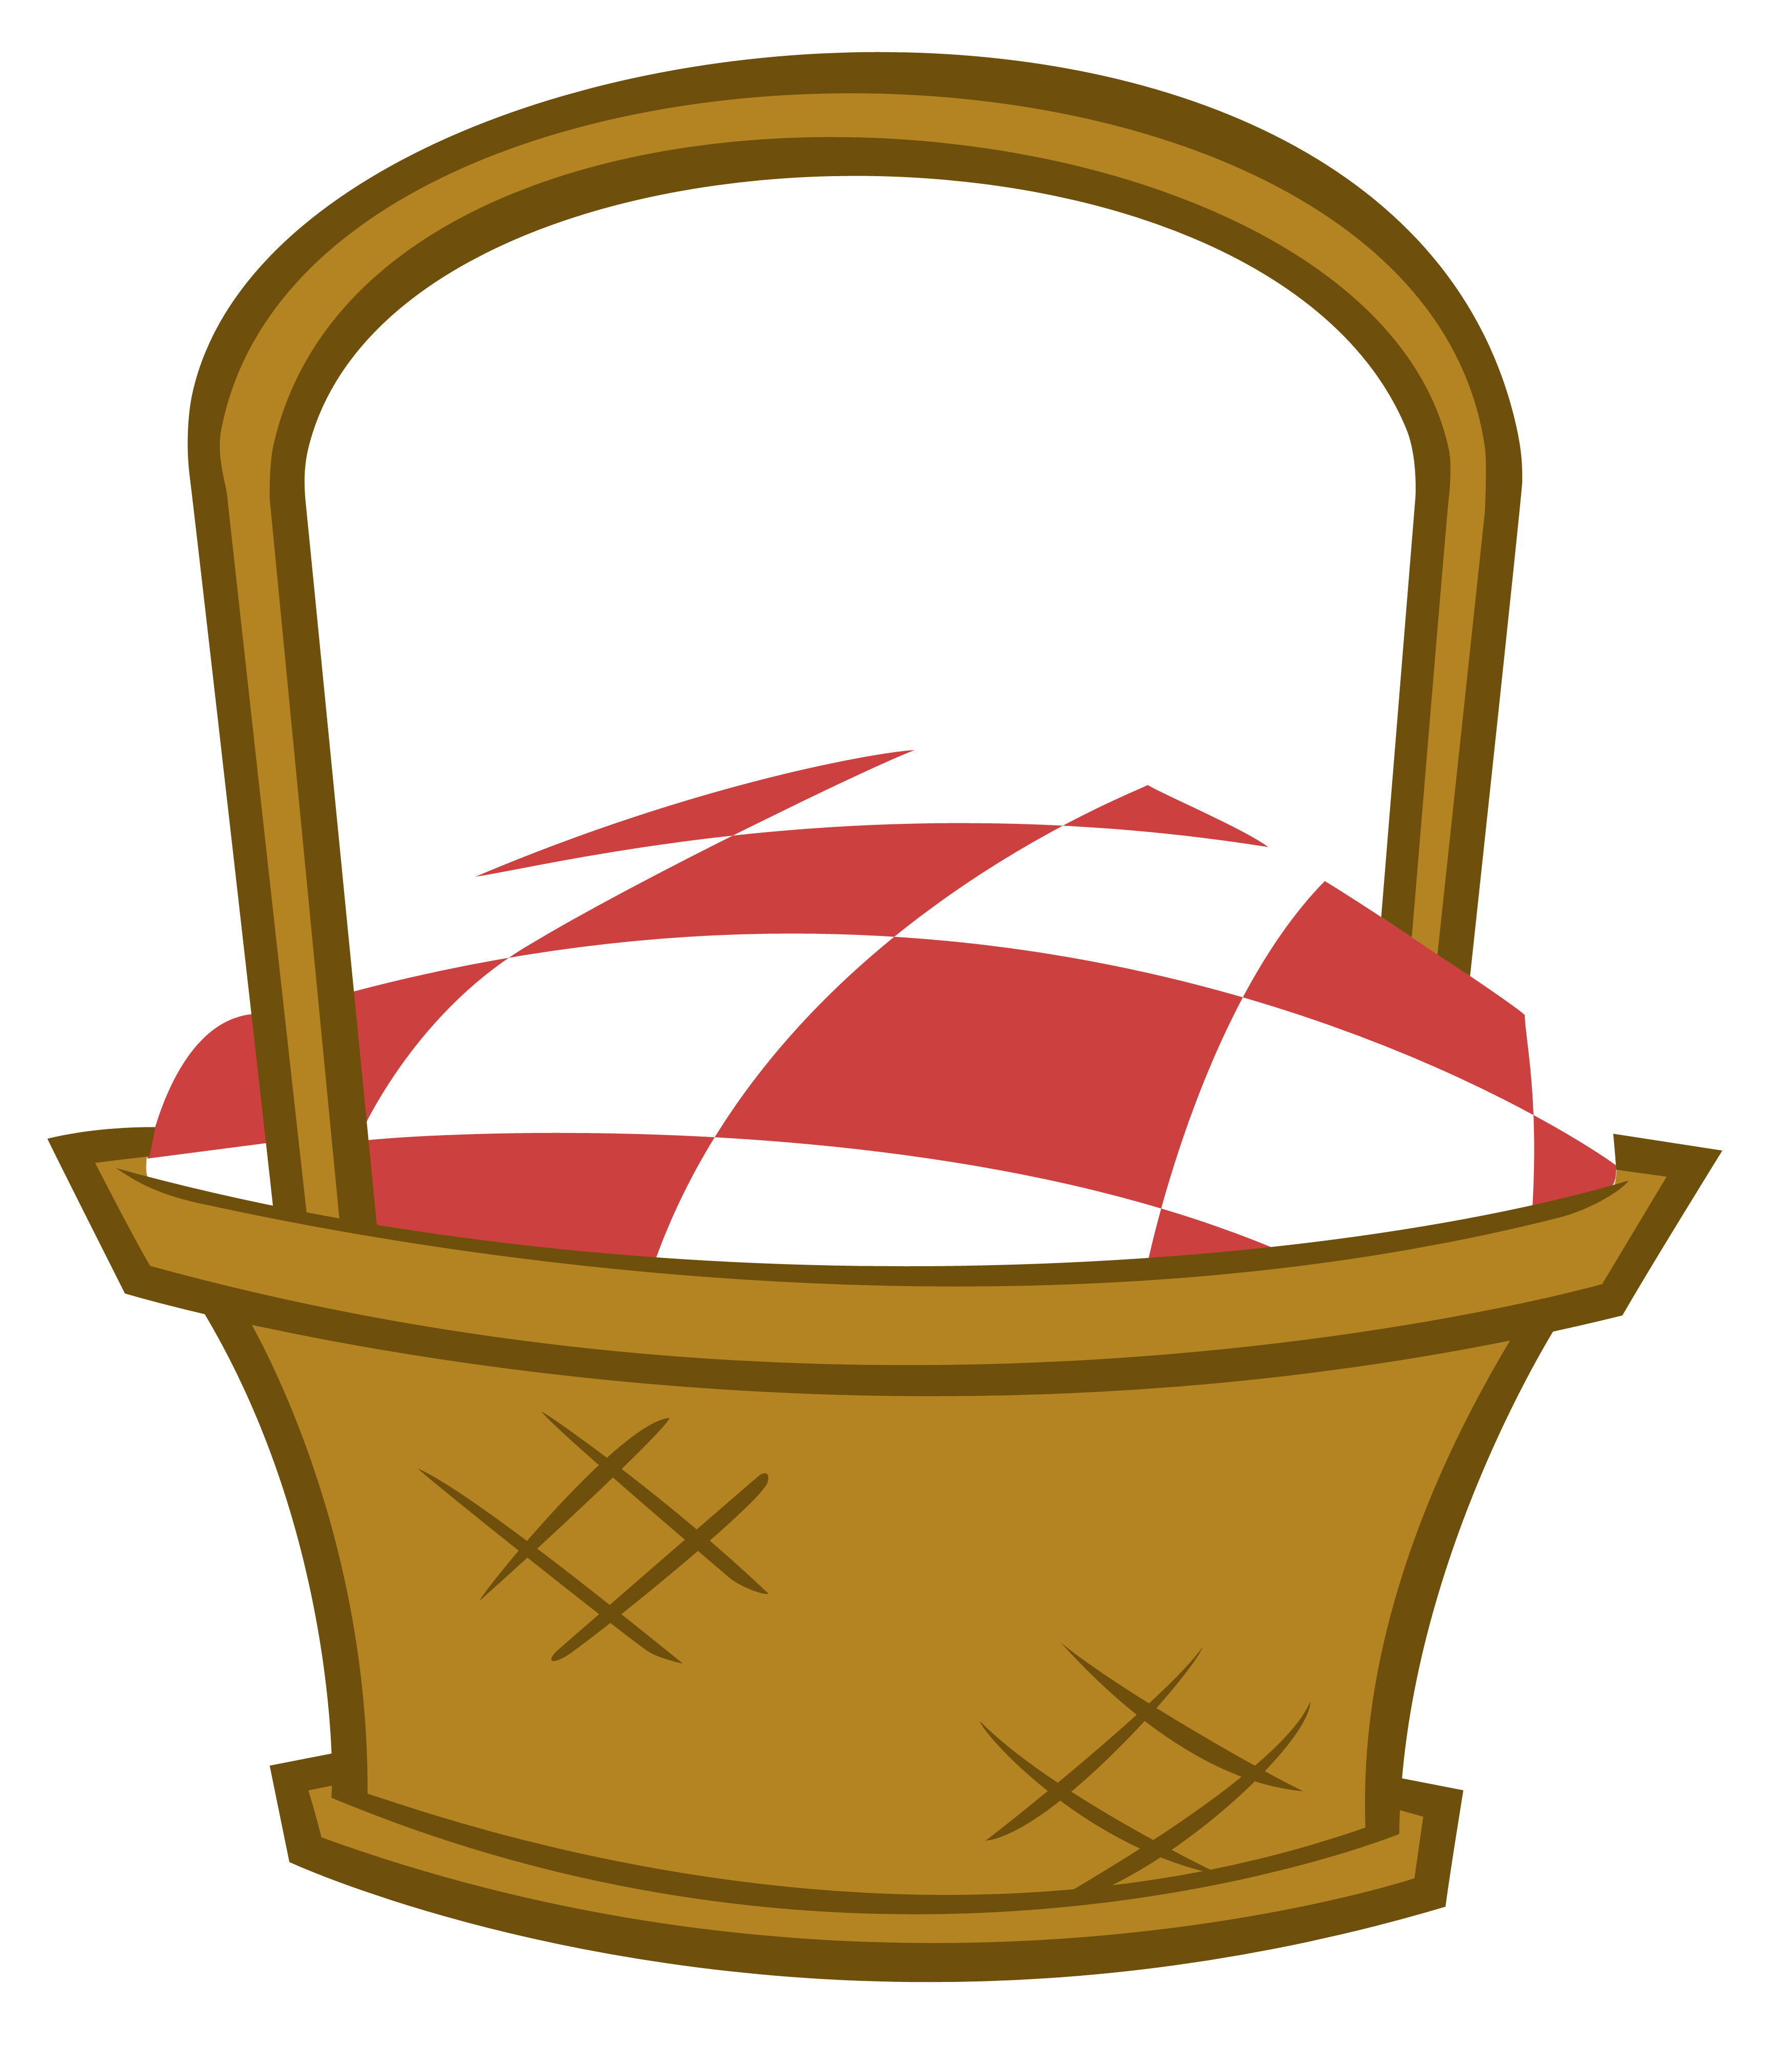 png free stock A b ea bdd. Basket clipart.